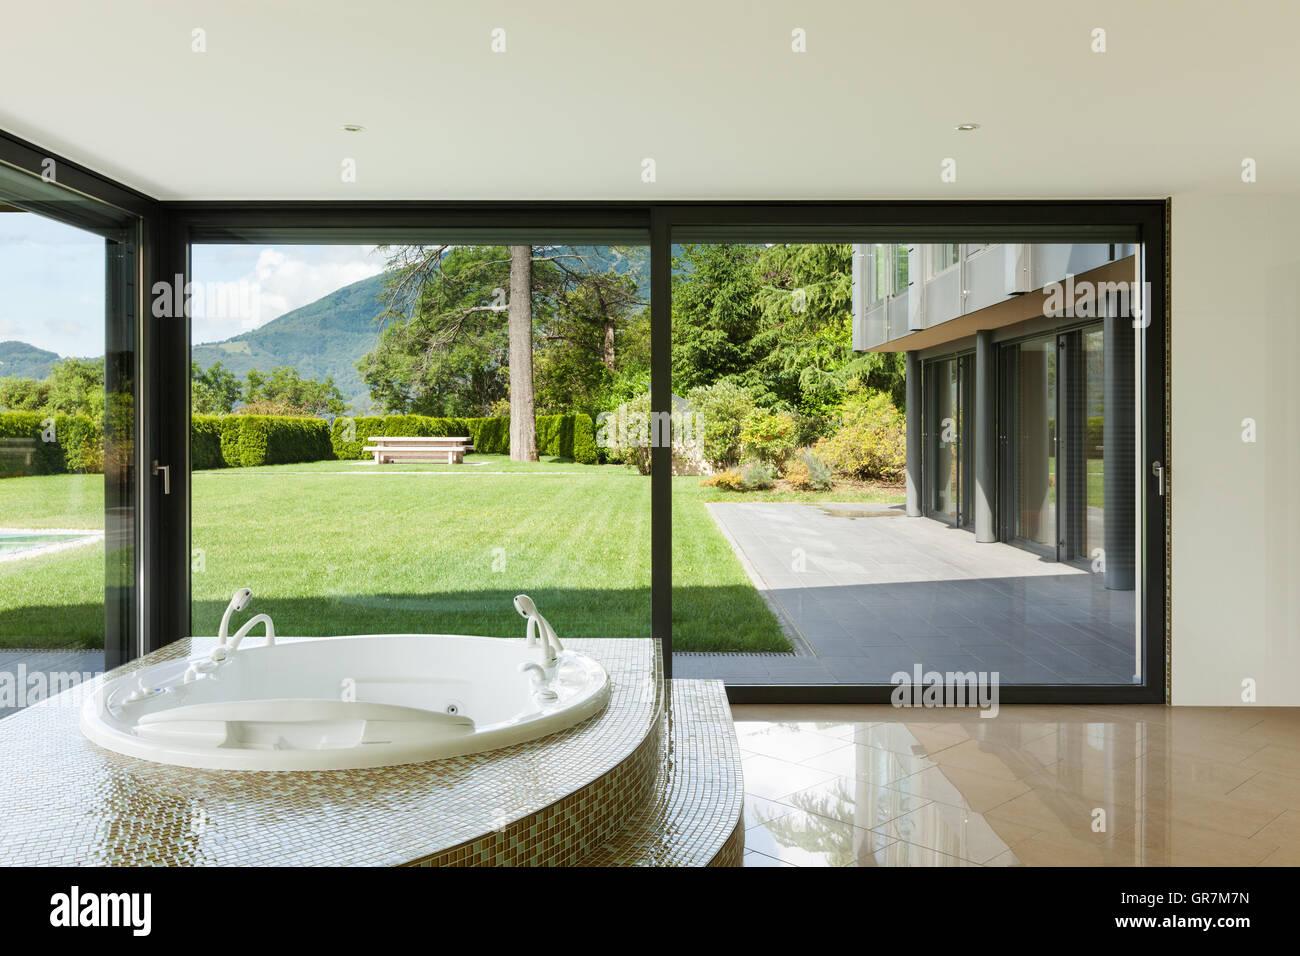 Beautiful Room With Jacuzzi, Window Overlooking The Garden